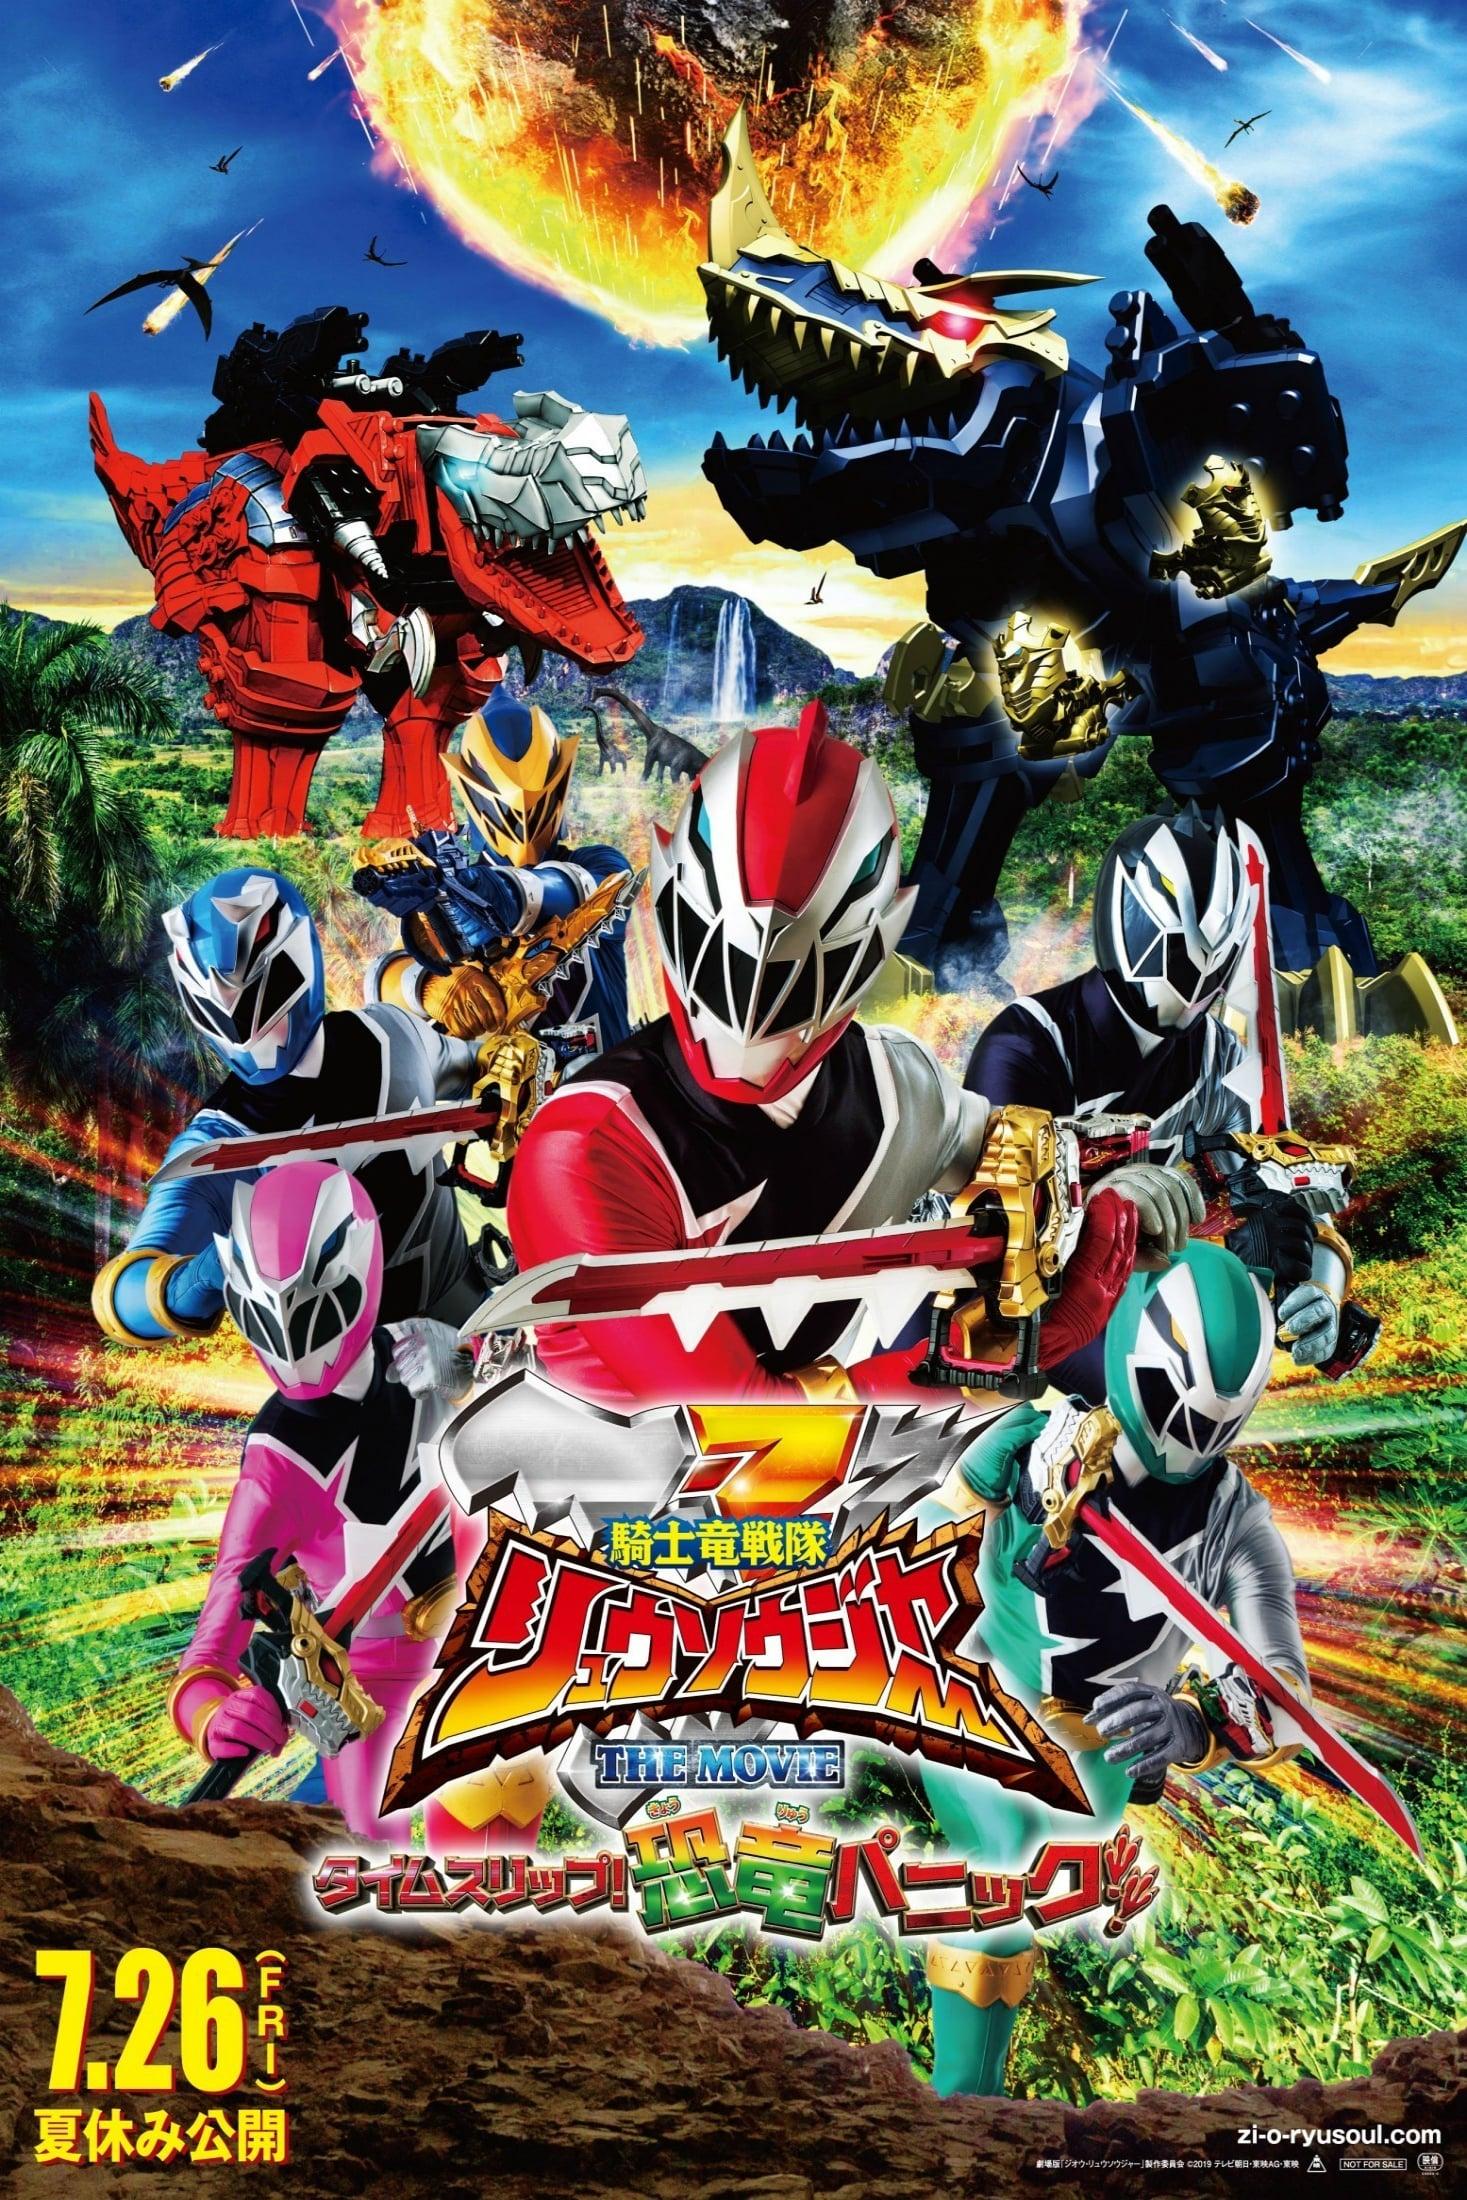 Kishiryu Sentai Ryusoulger The Movie: Time Slip! Dinosaur Panic!!